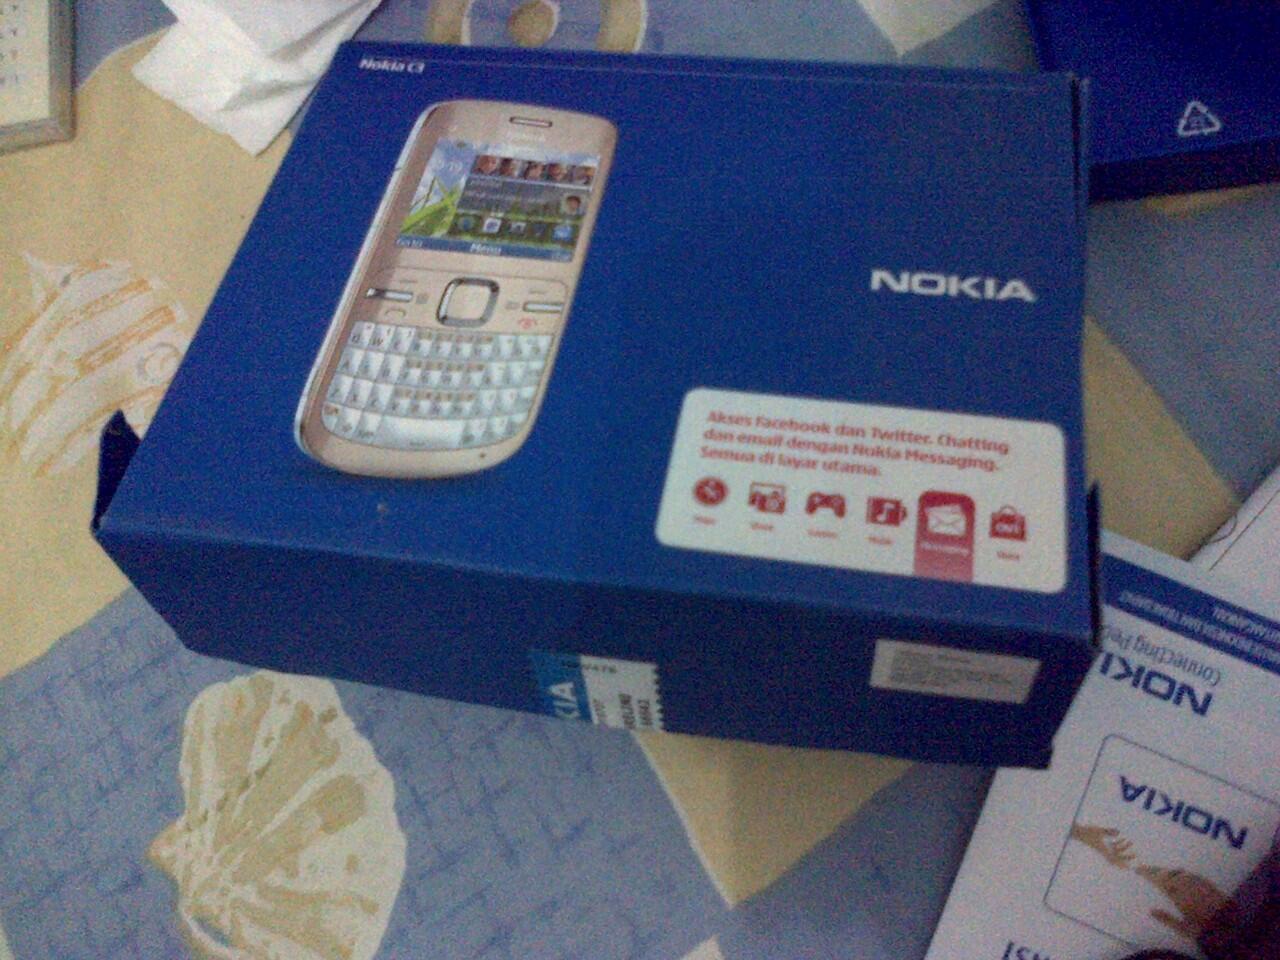 [WTS] Di jual handphone Nokia C3 masih kaya baru, mulus, murah :D